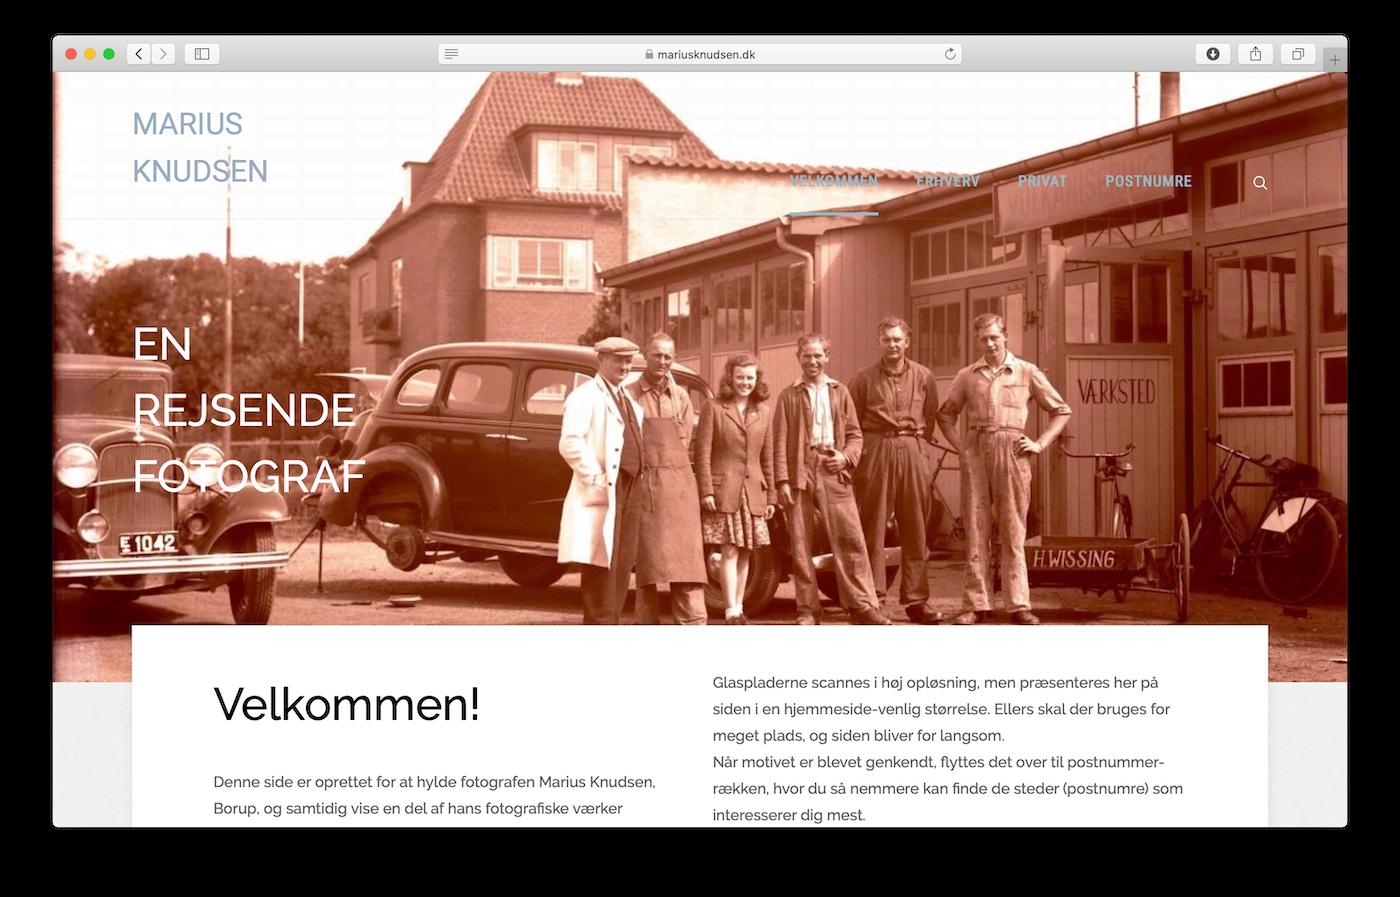 gamle billeder fra fotograf Marius Knudsen